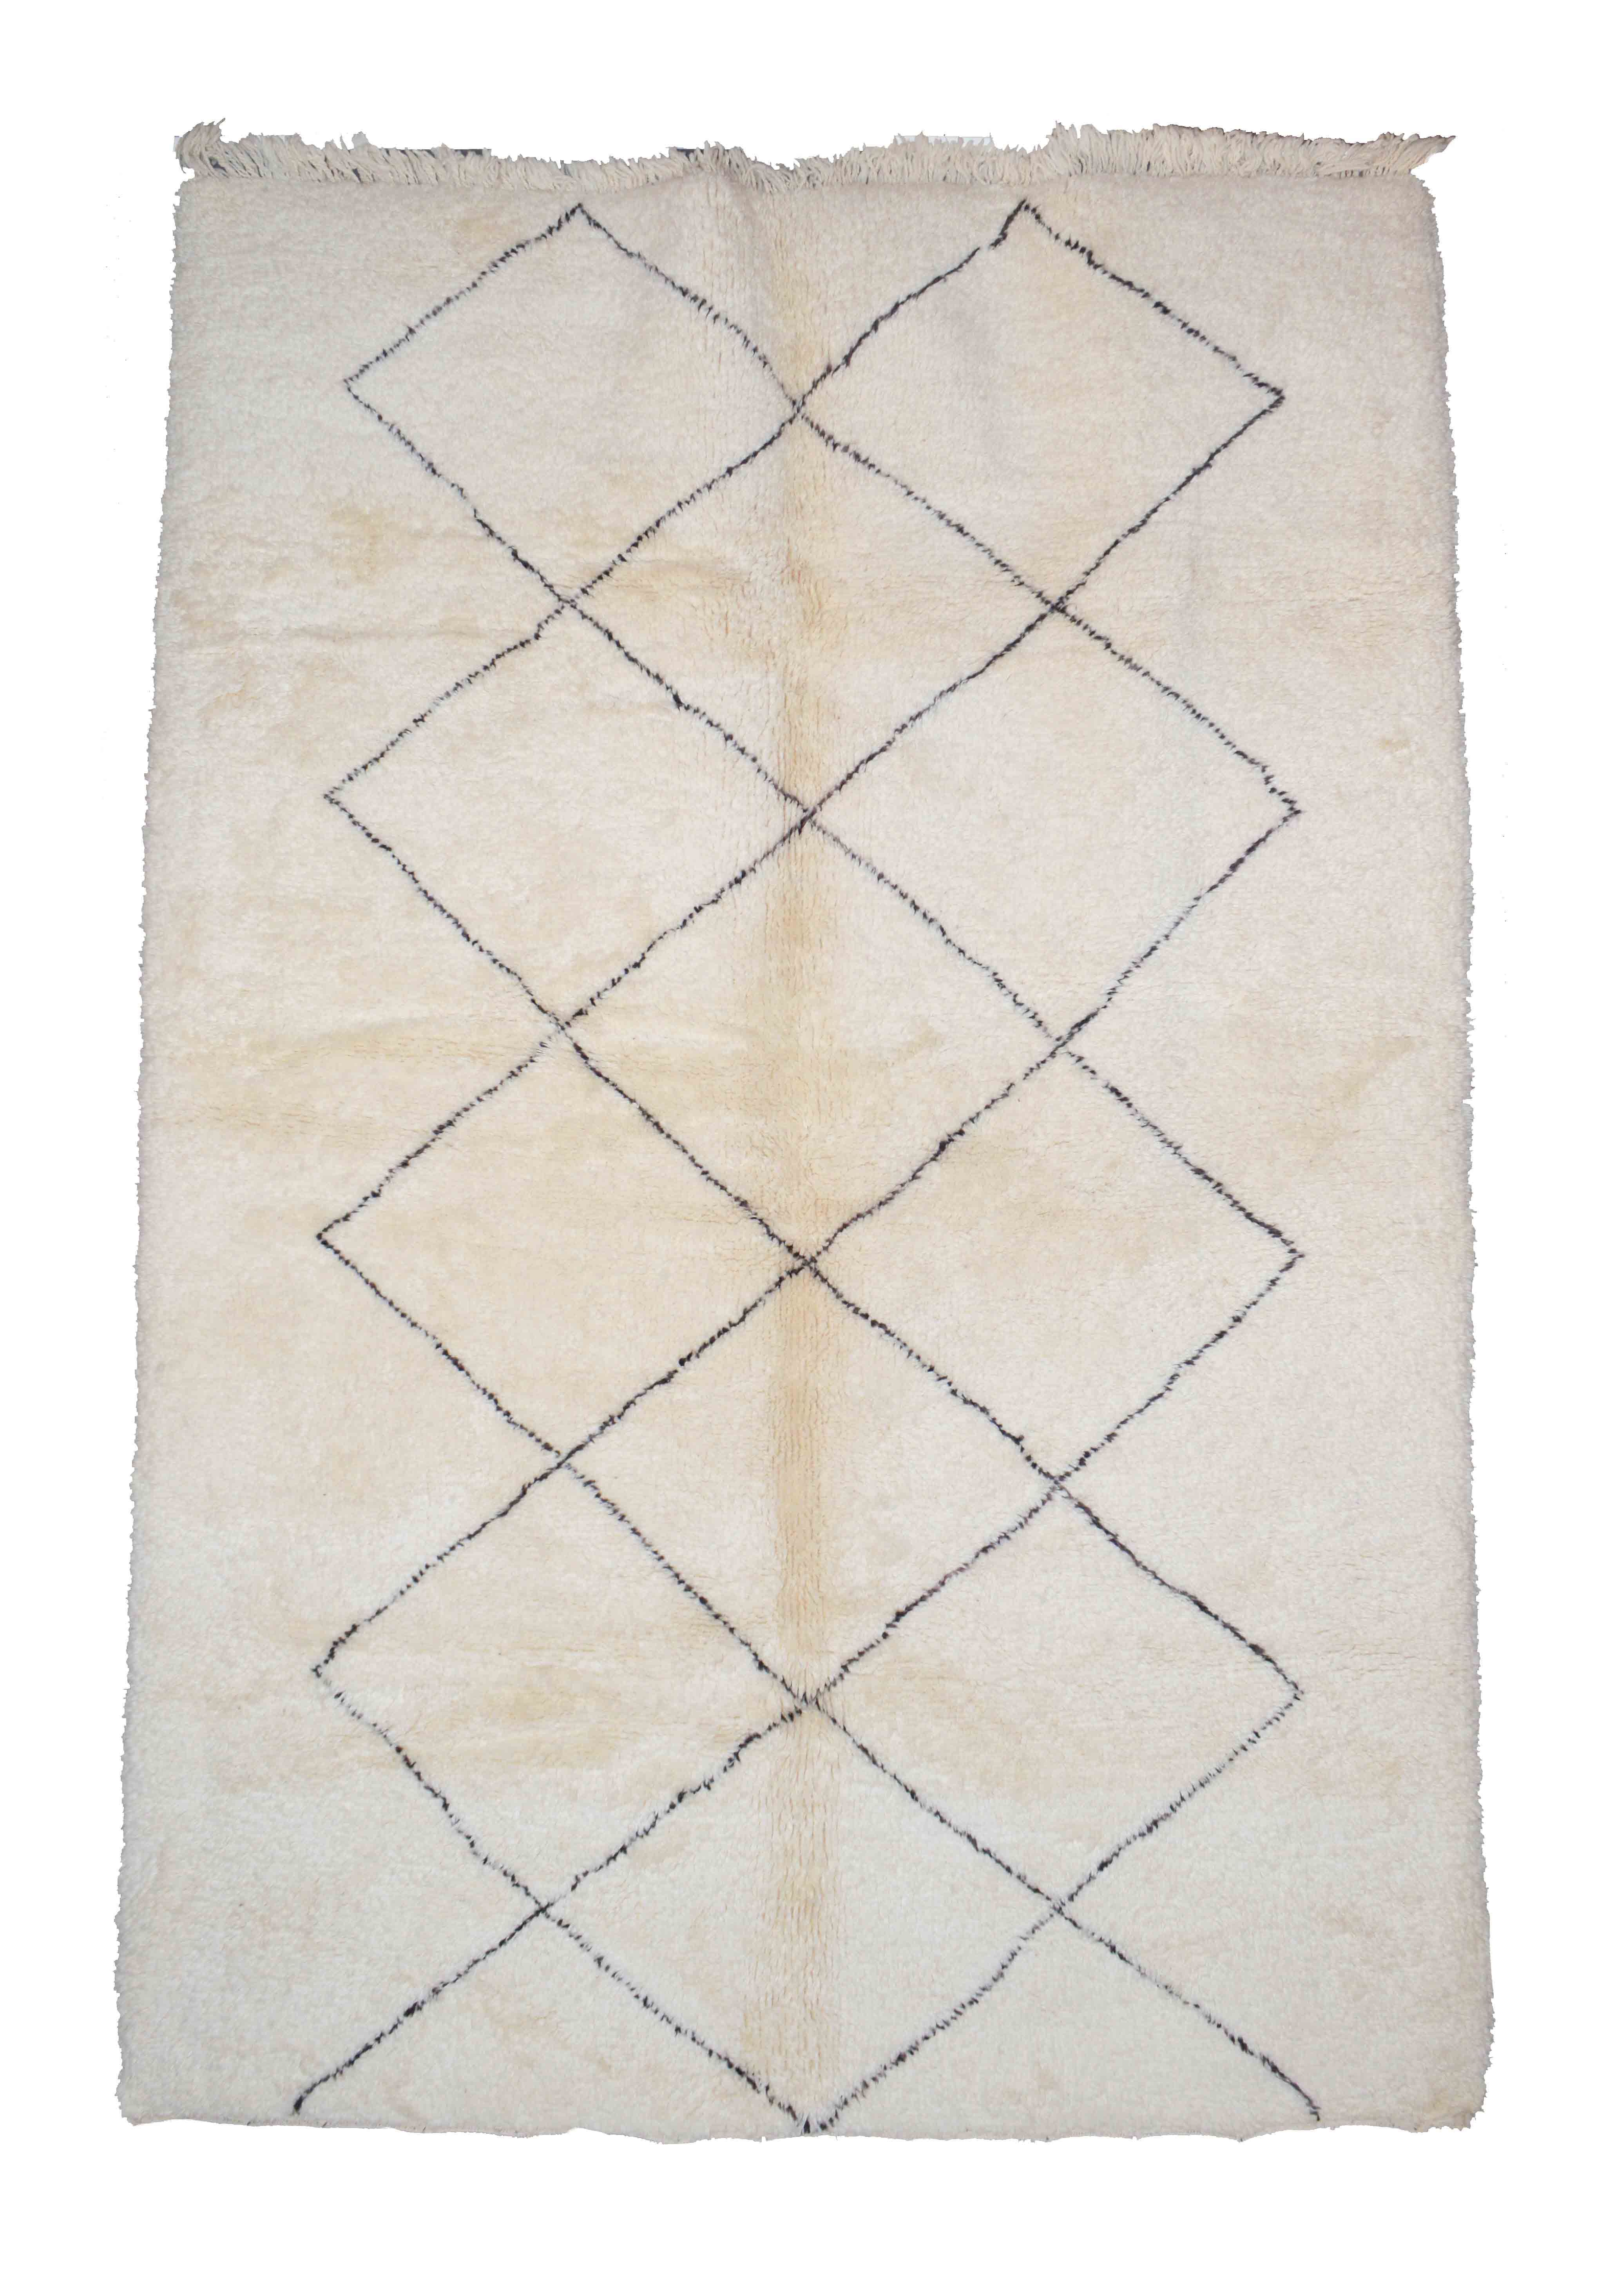 Beni Ourain BN01-21- 300 x 205 cm